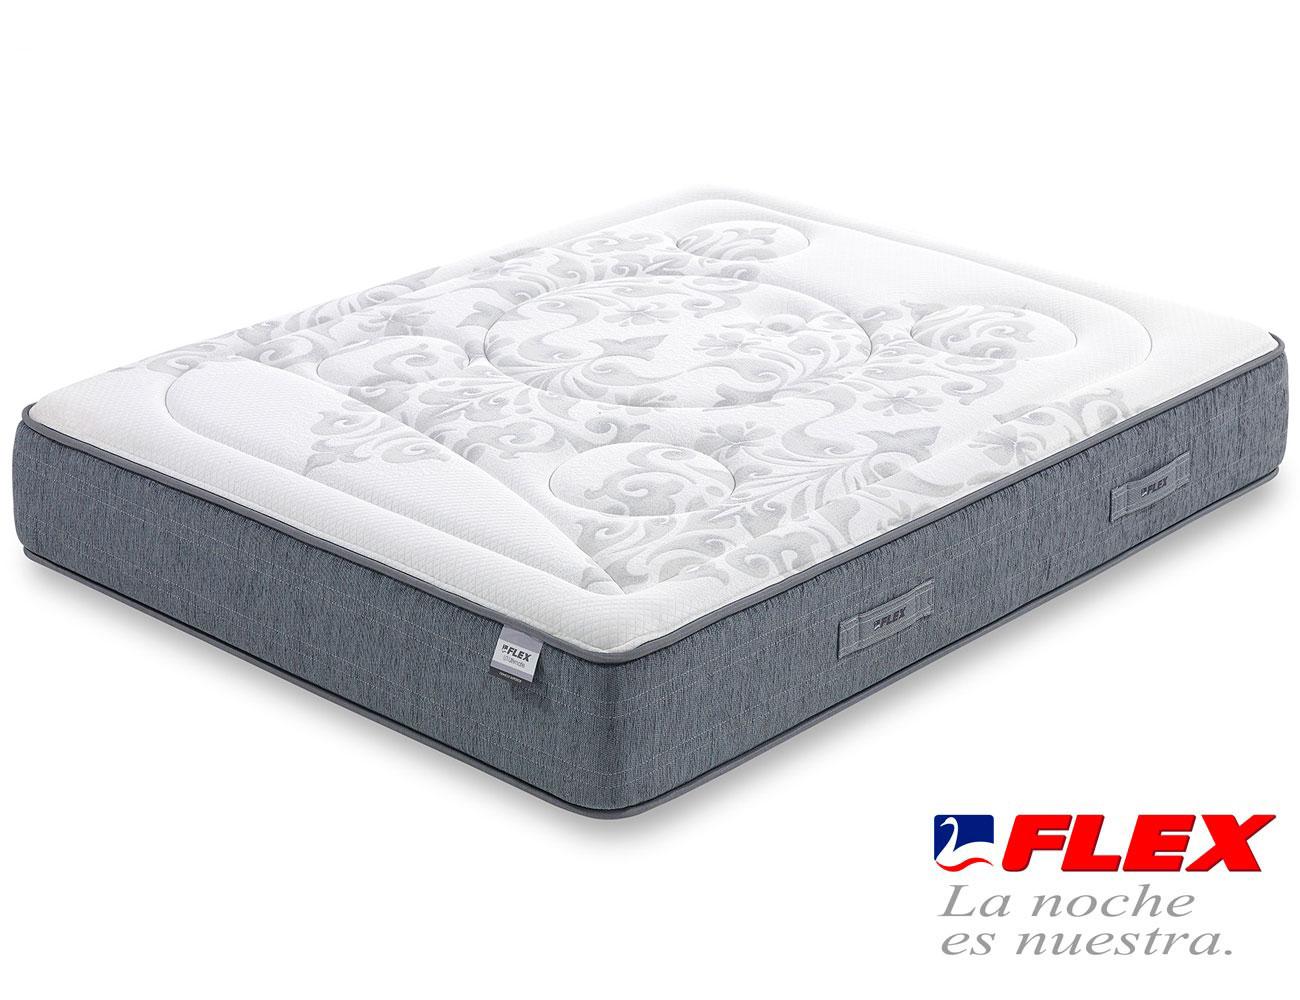 Colchon flex airvex viscoelastica gel garbi superior15